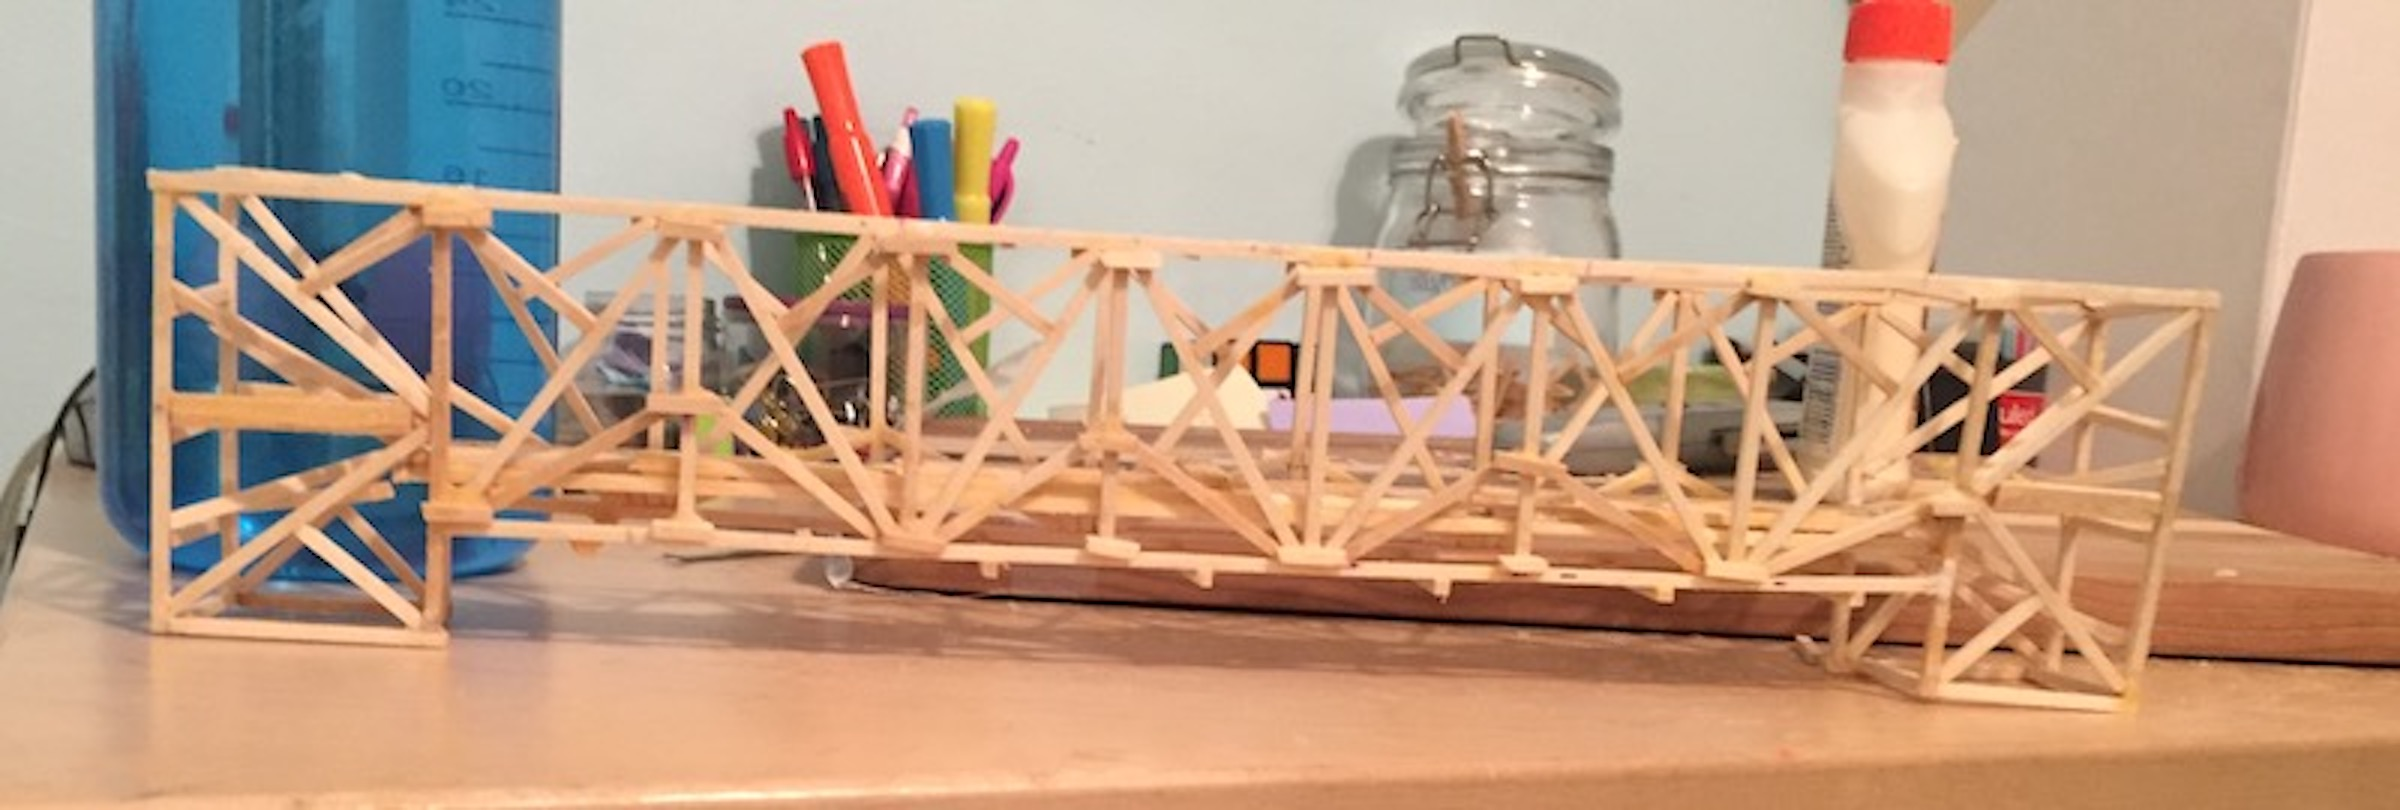 2017 Jan Abby Bridge